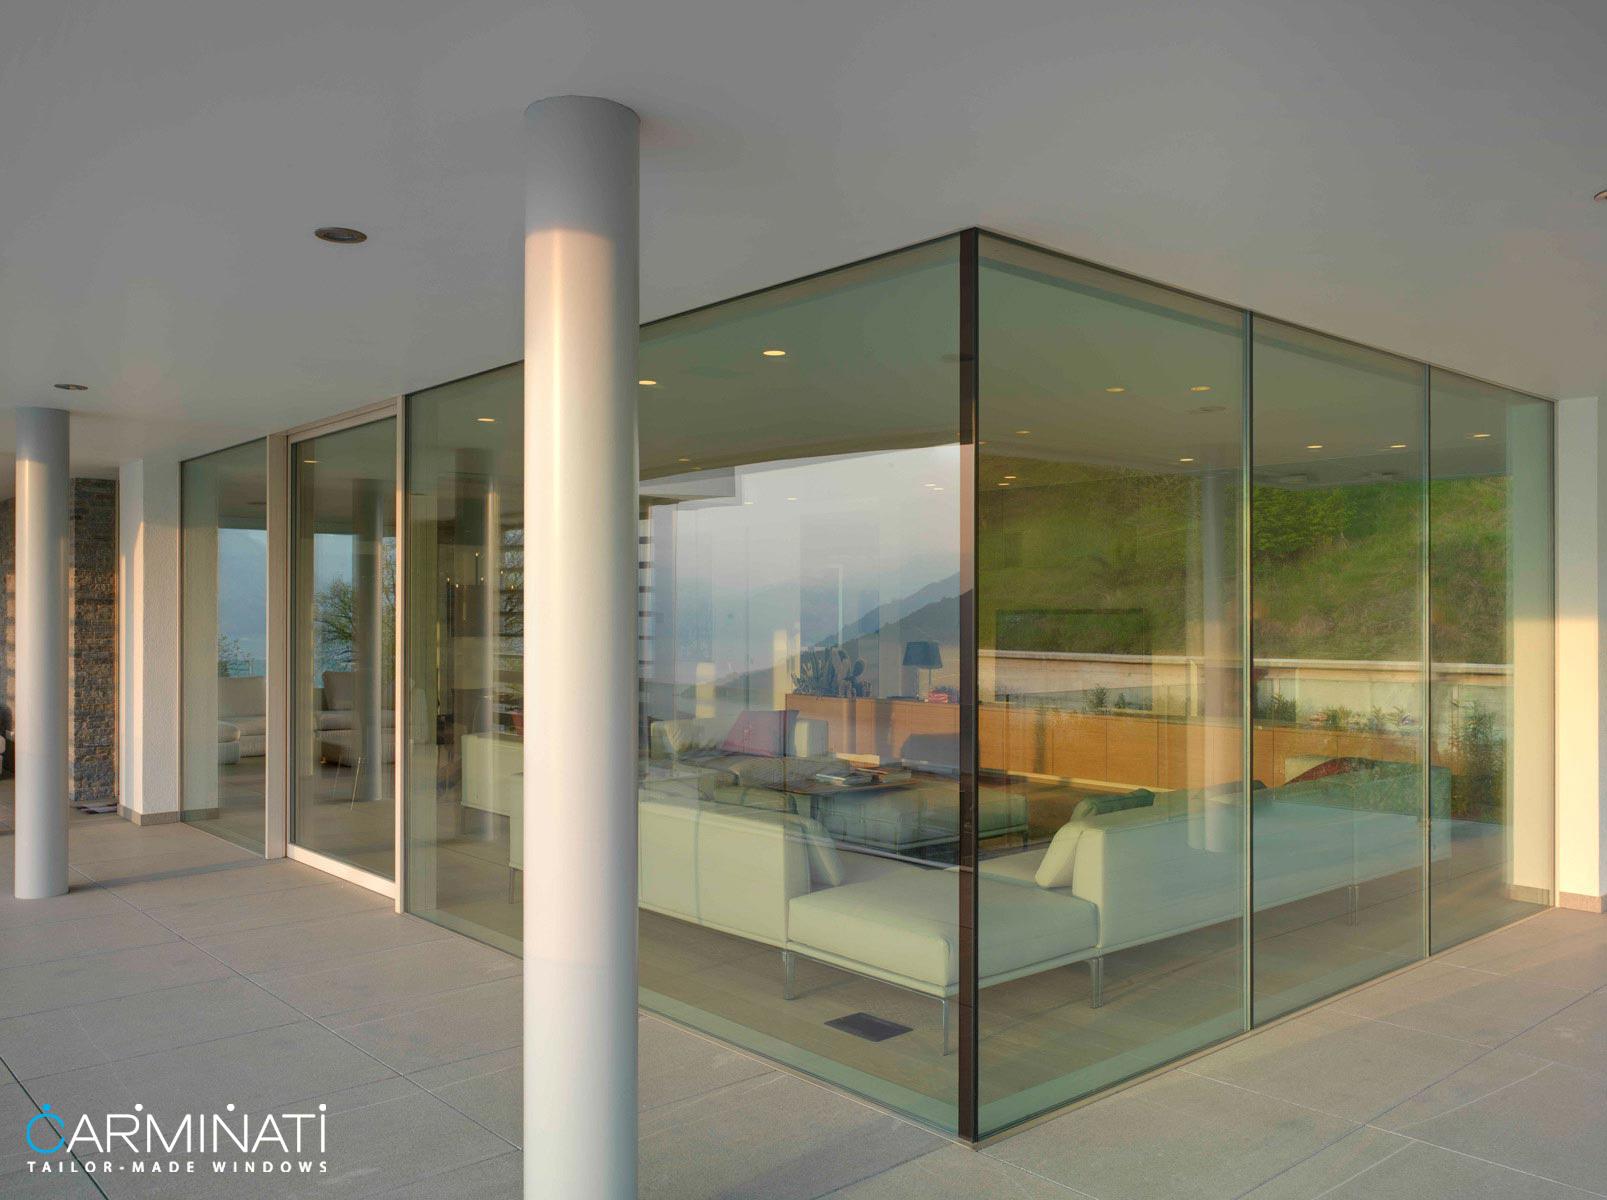 The corner detail of Carminati's Skyline minimal frame window